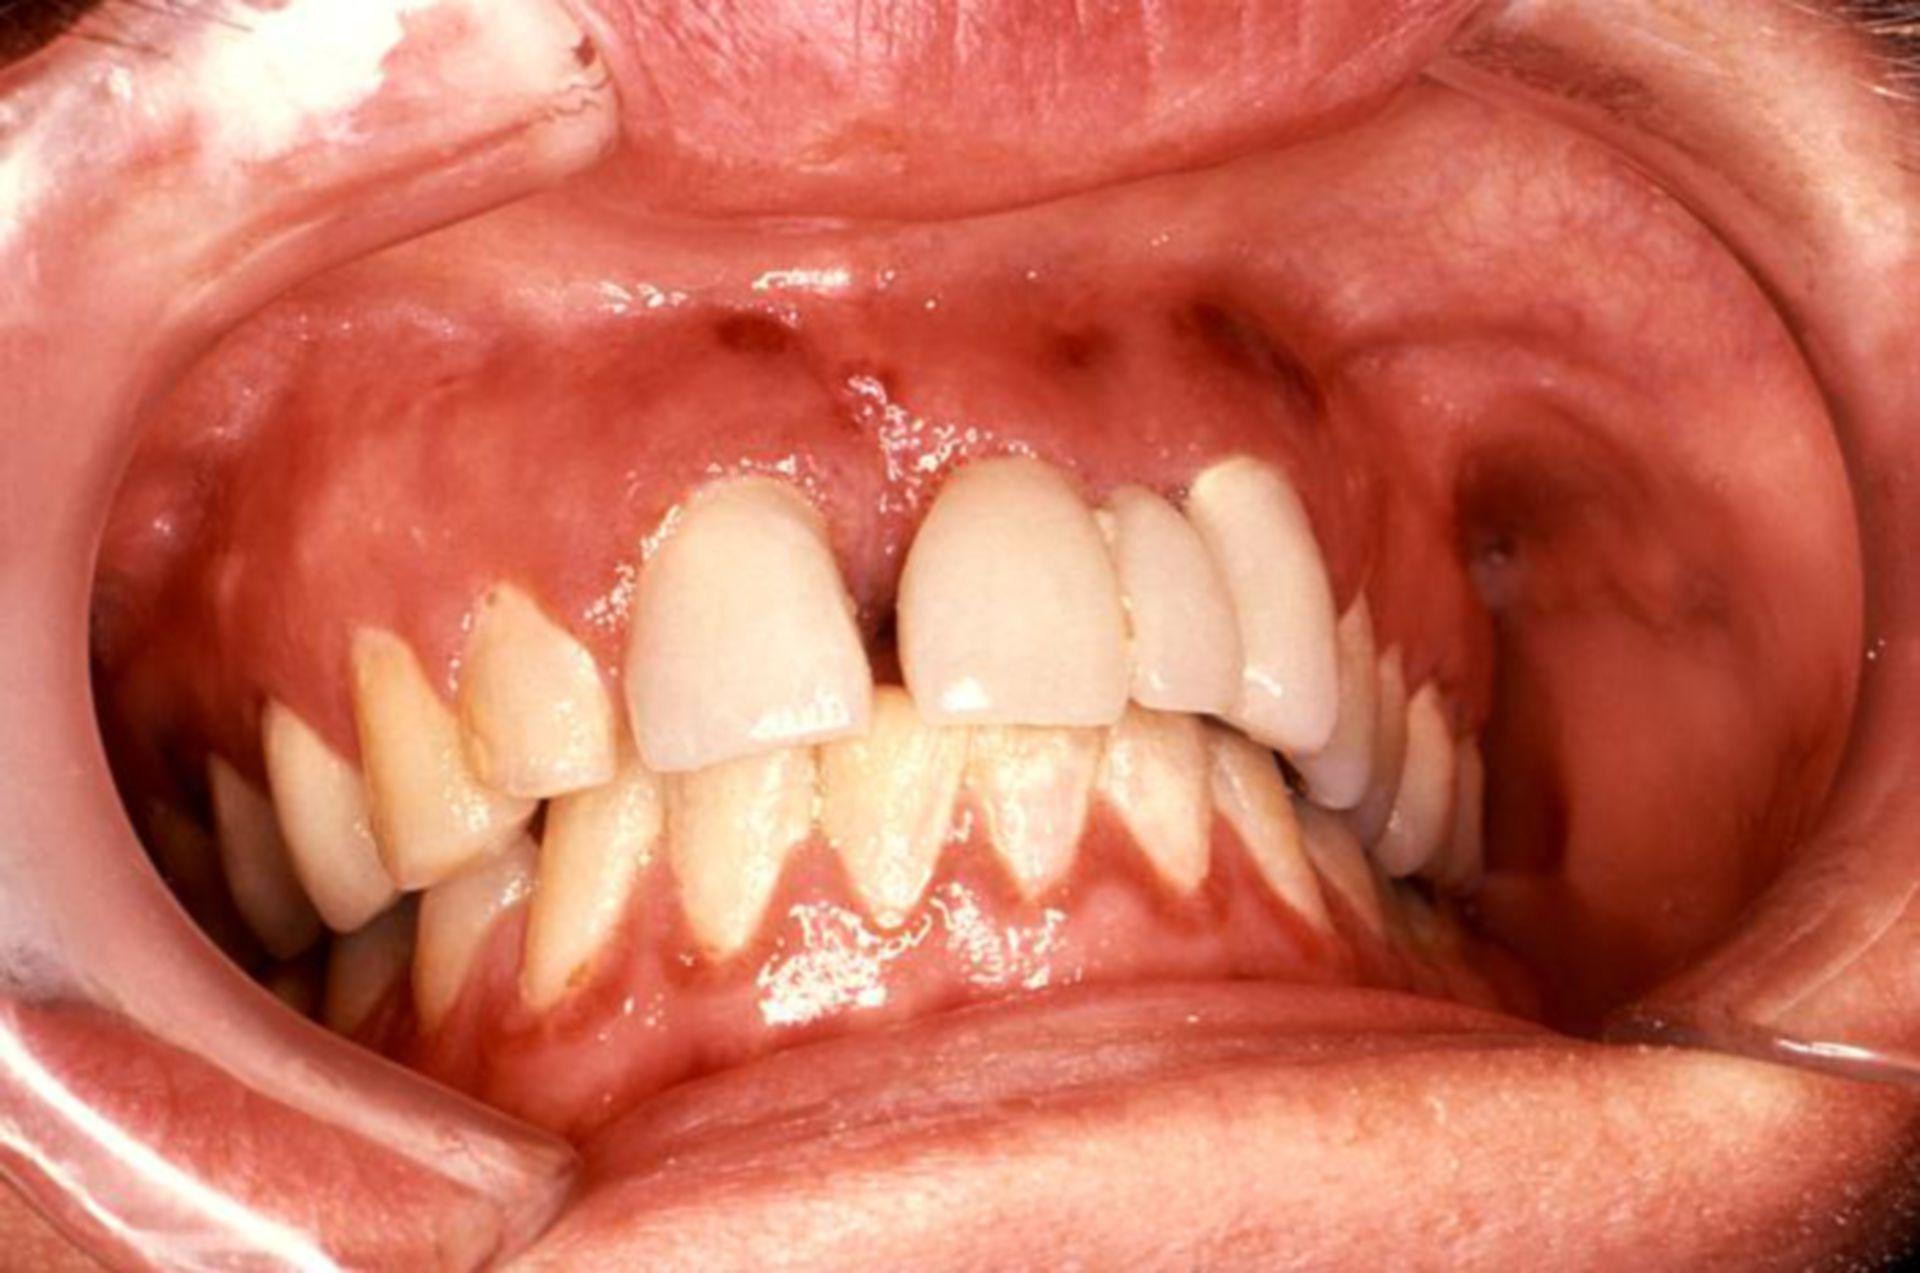 Orale Erkrankung bei AIDS: Kaposi-Sarkom